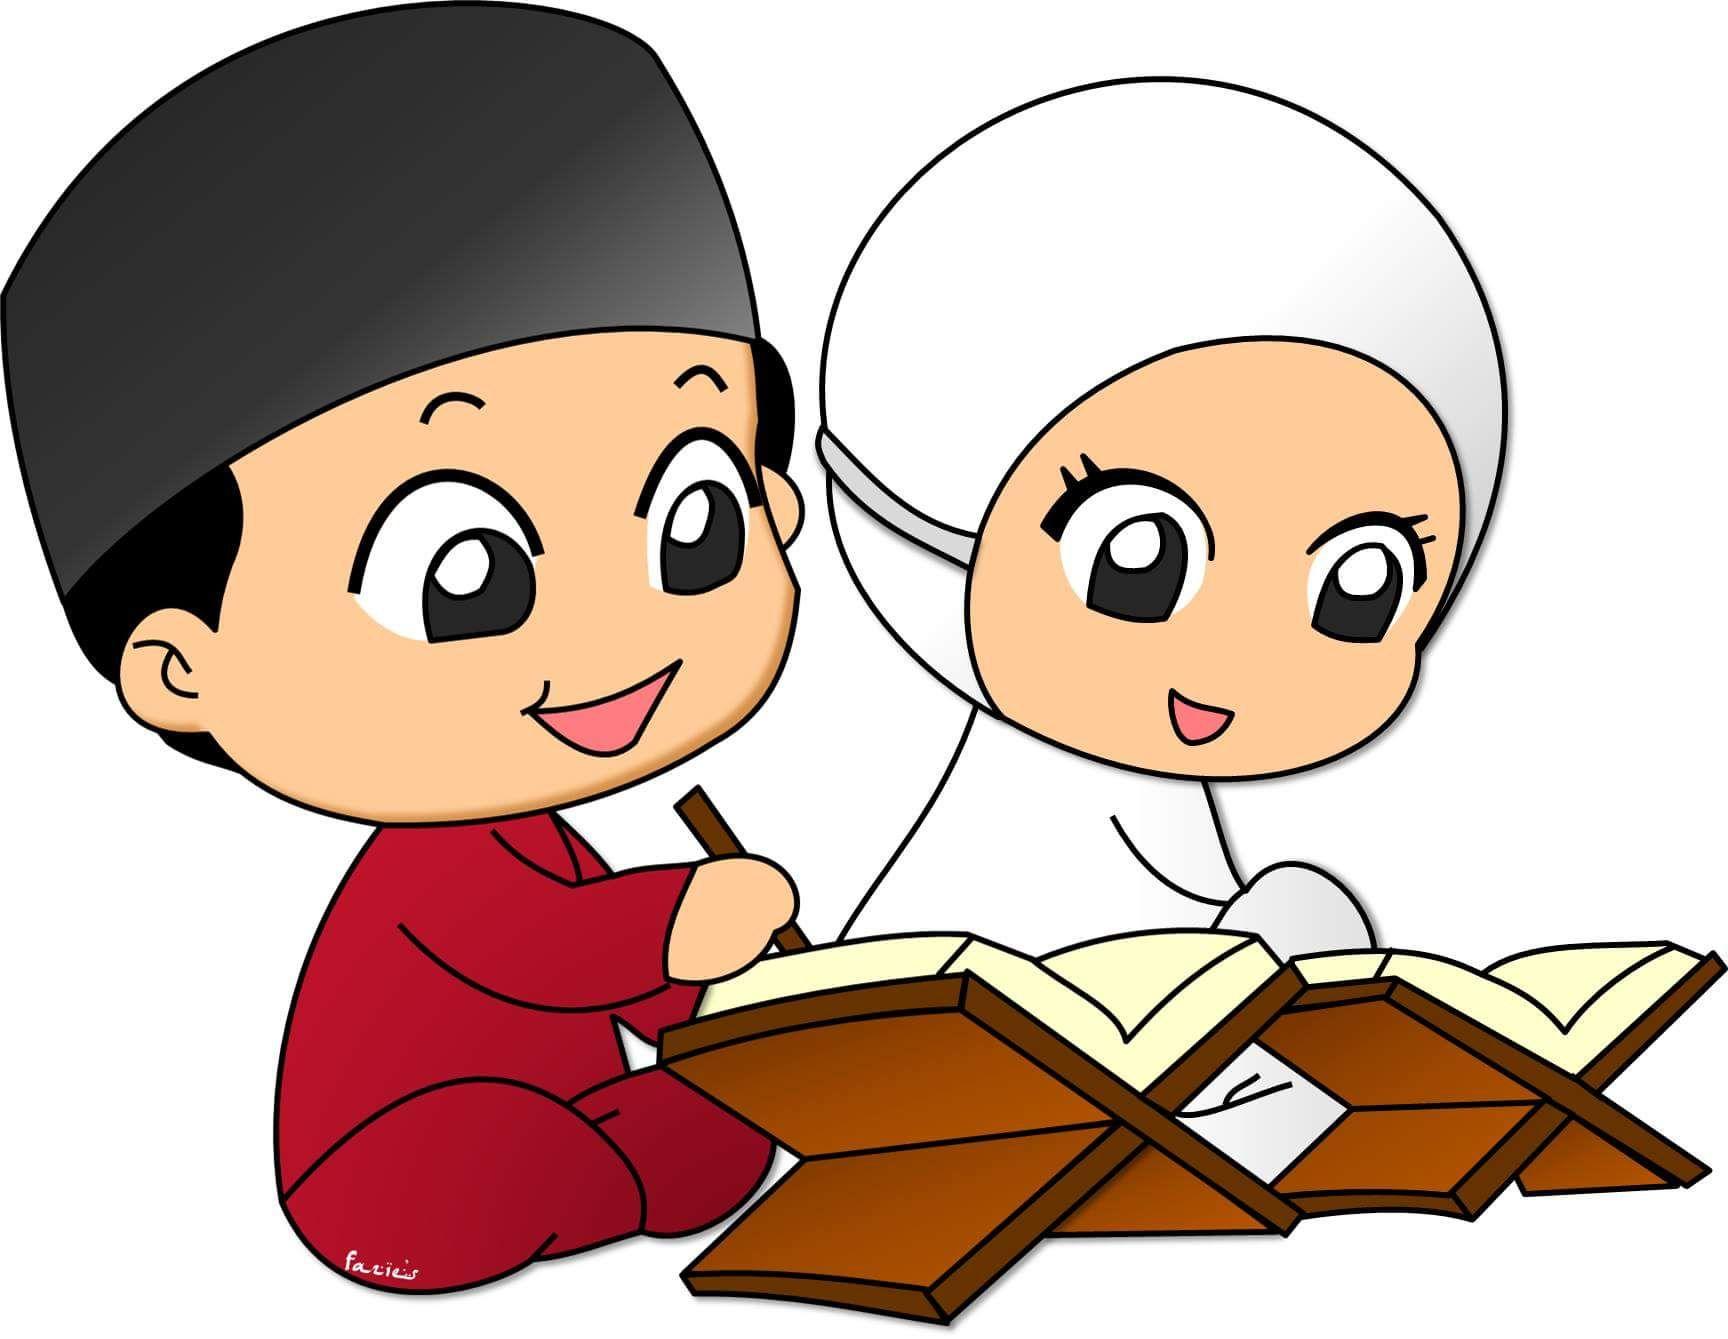 MUSLIM Kartun, Gambar karakter, Kartun lucu